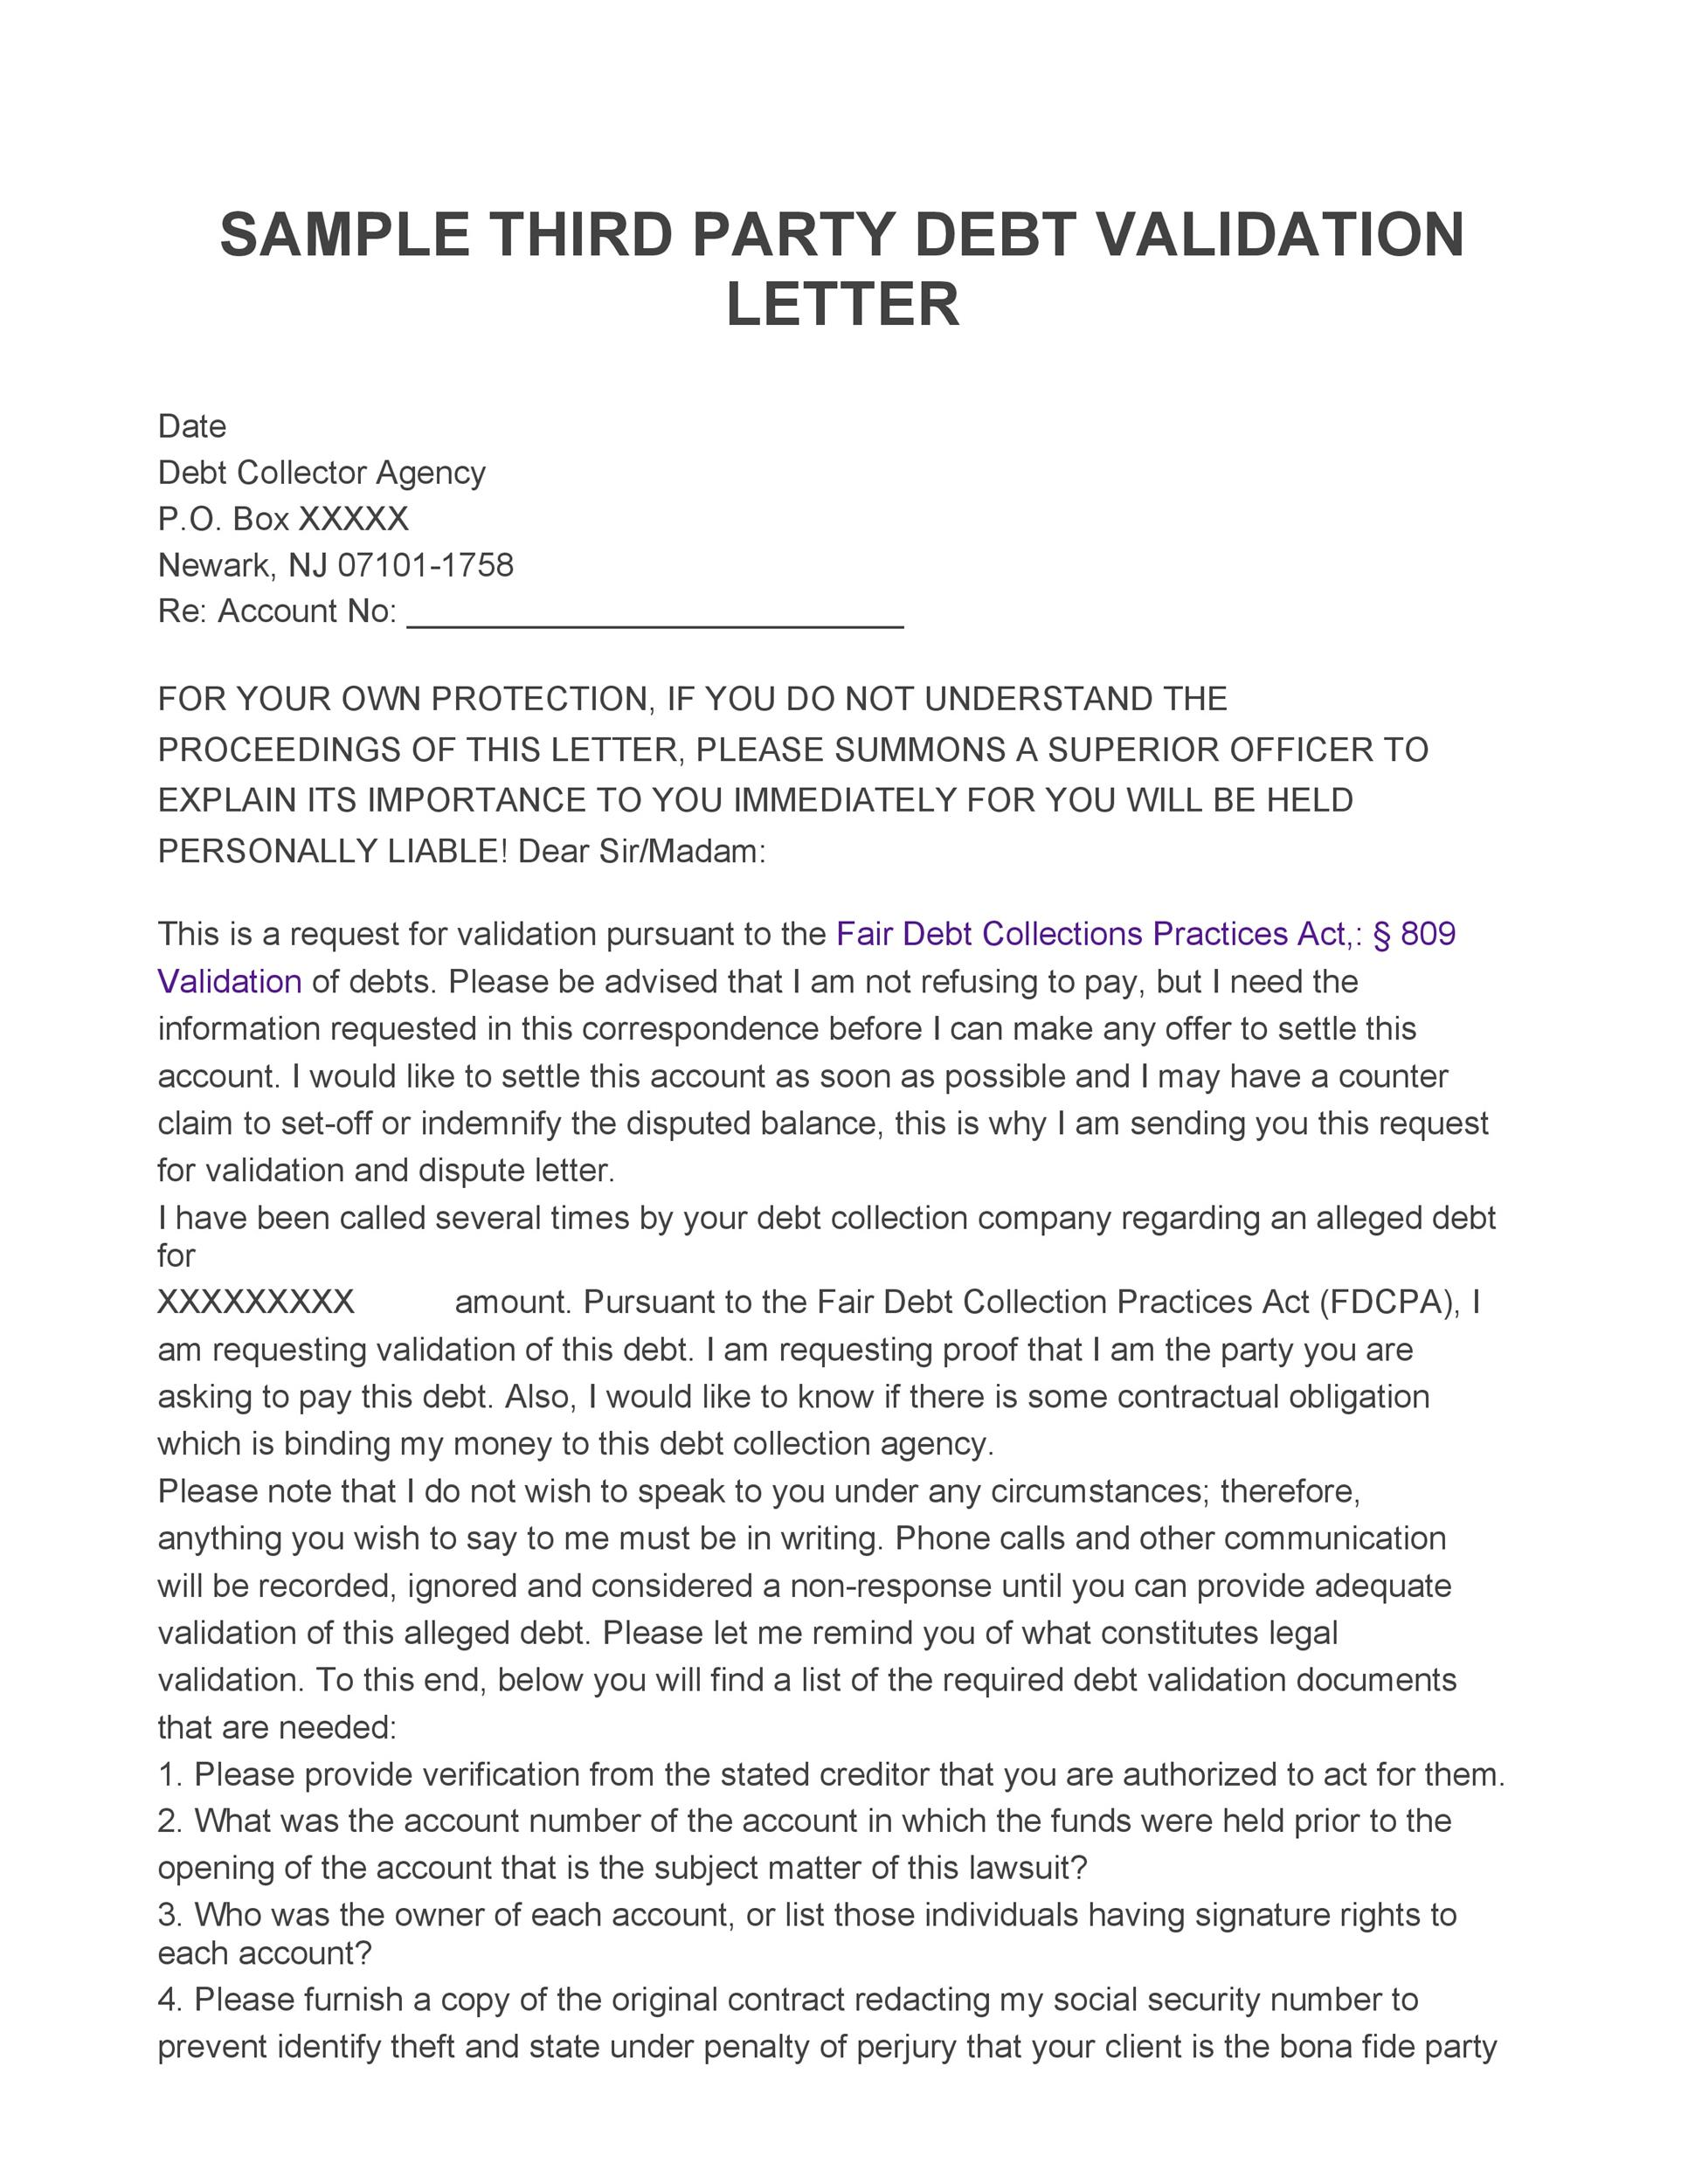 Free debt validation letter 43